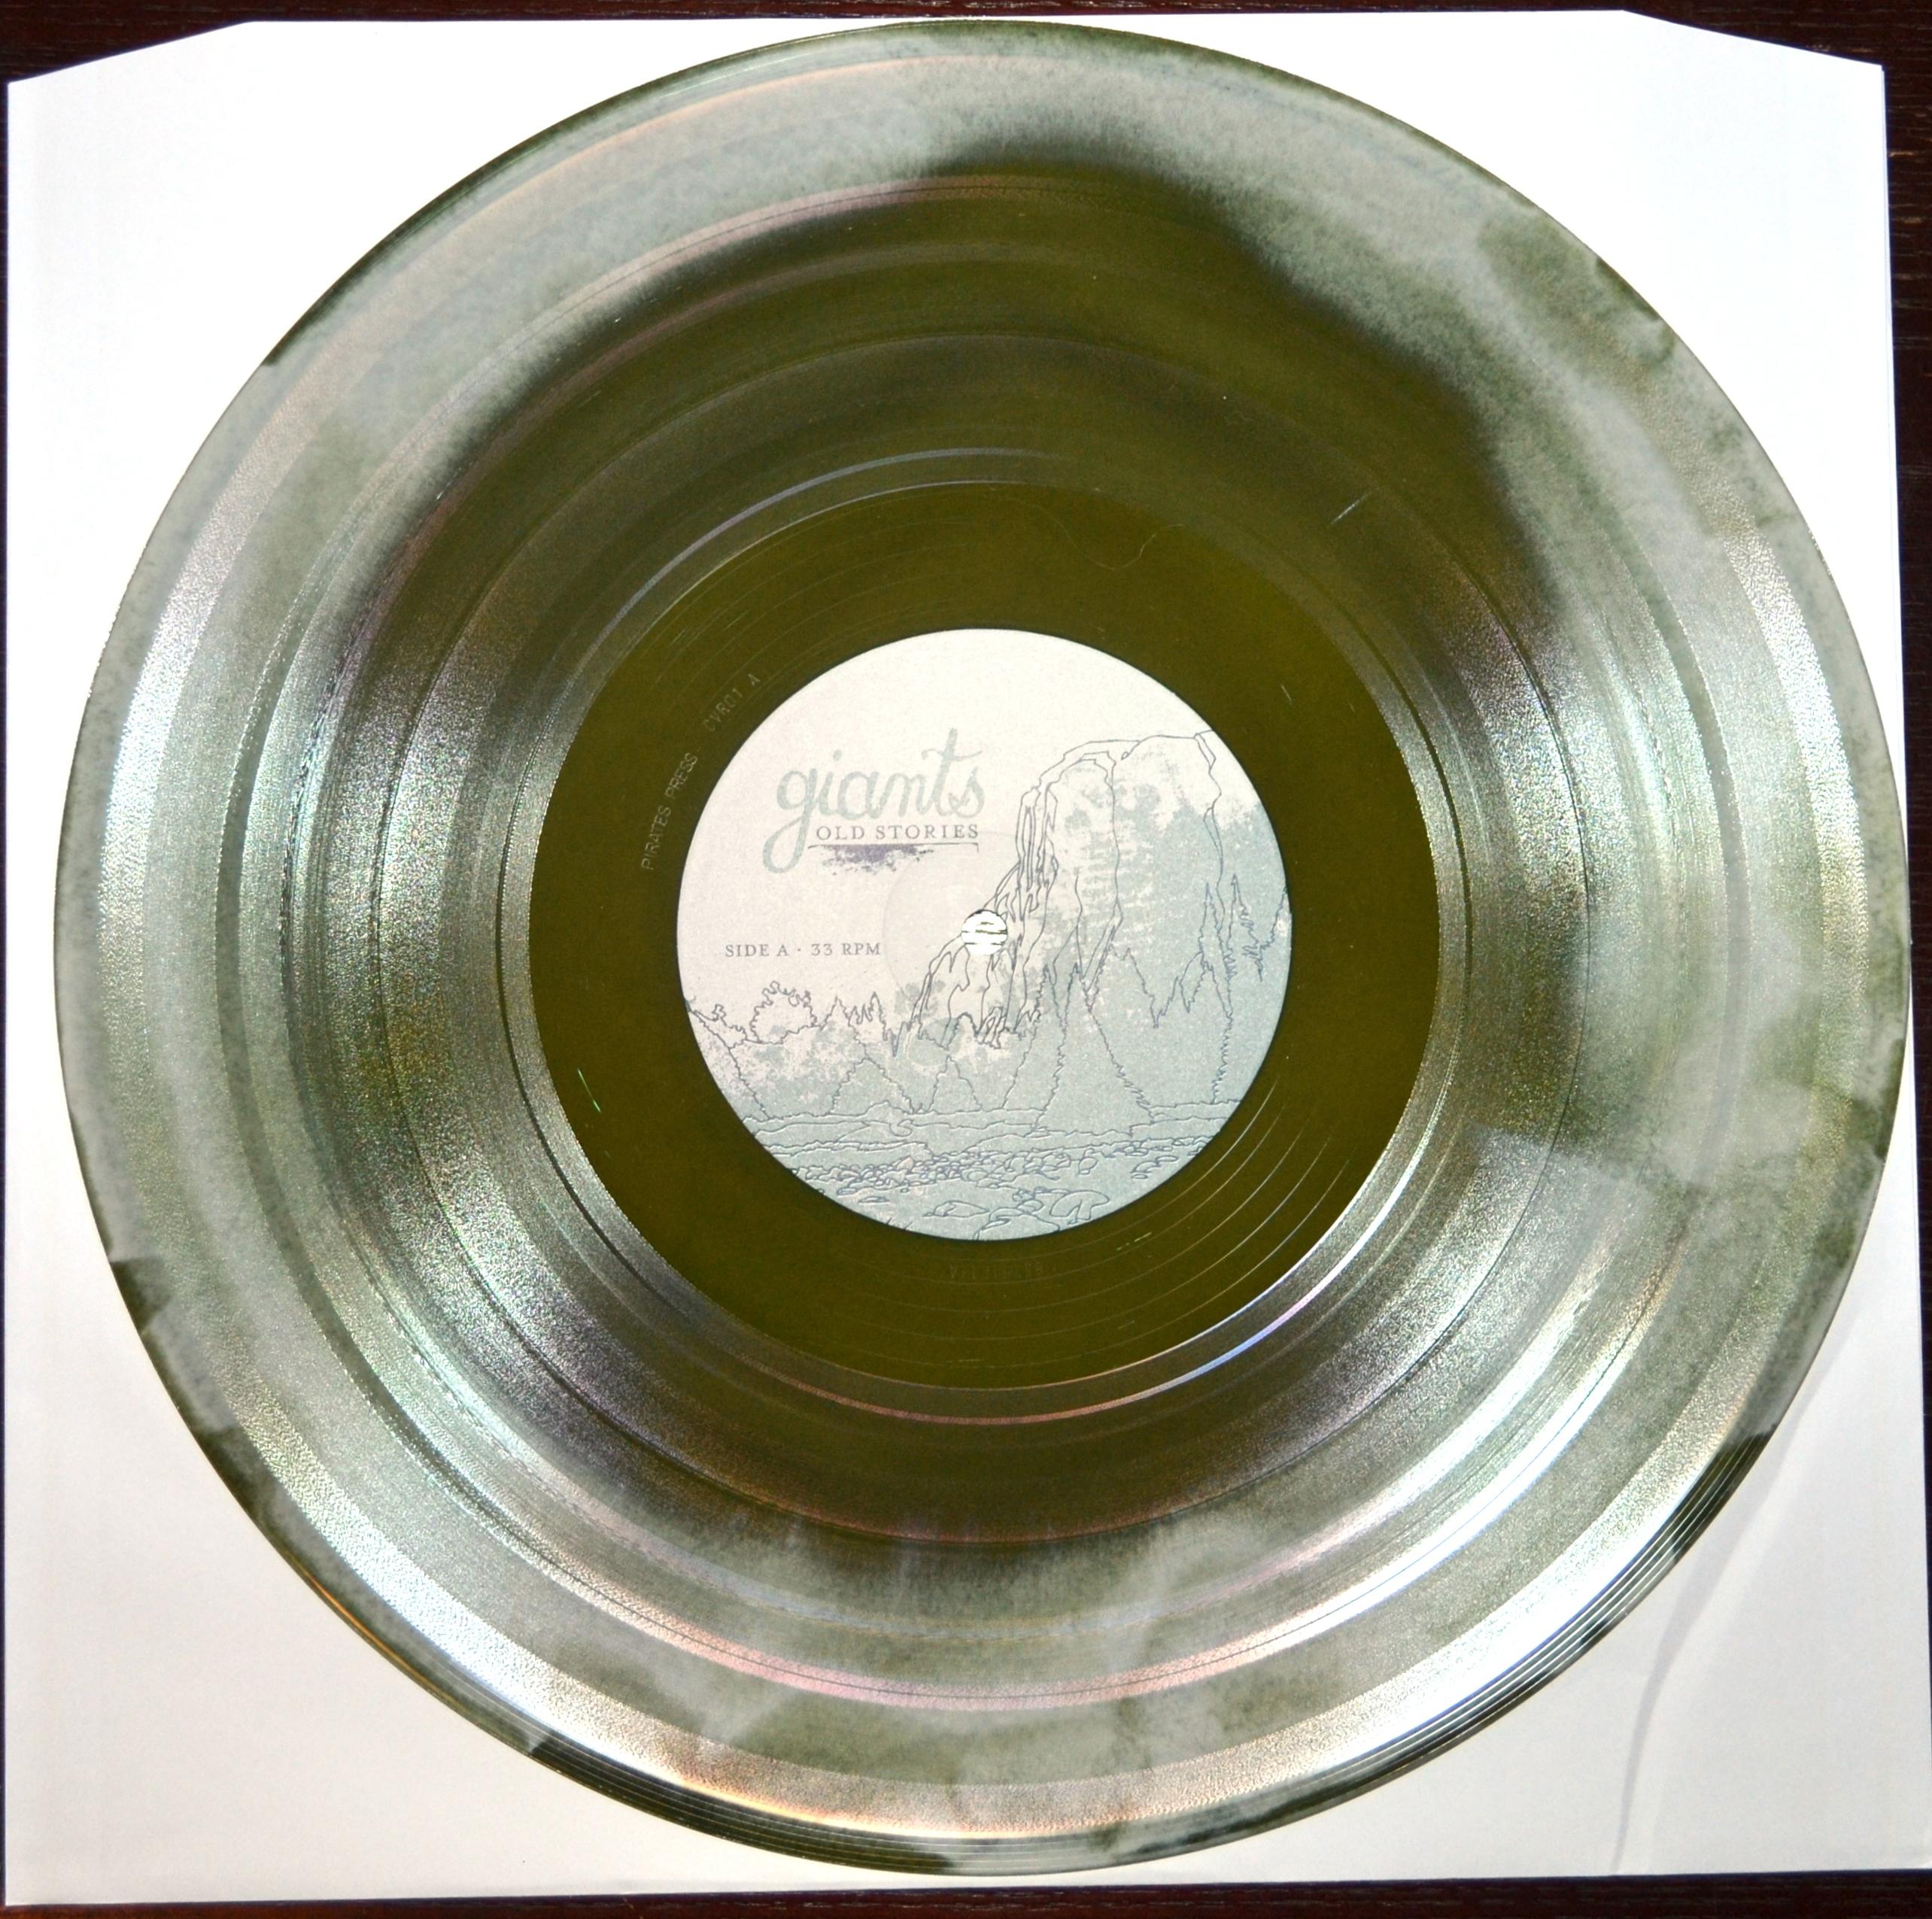 Giants - Old Stories Vinyl LP · Revealed Records · Online Store ...